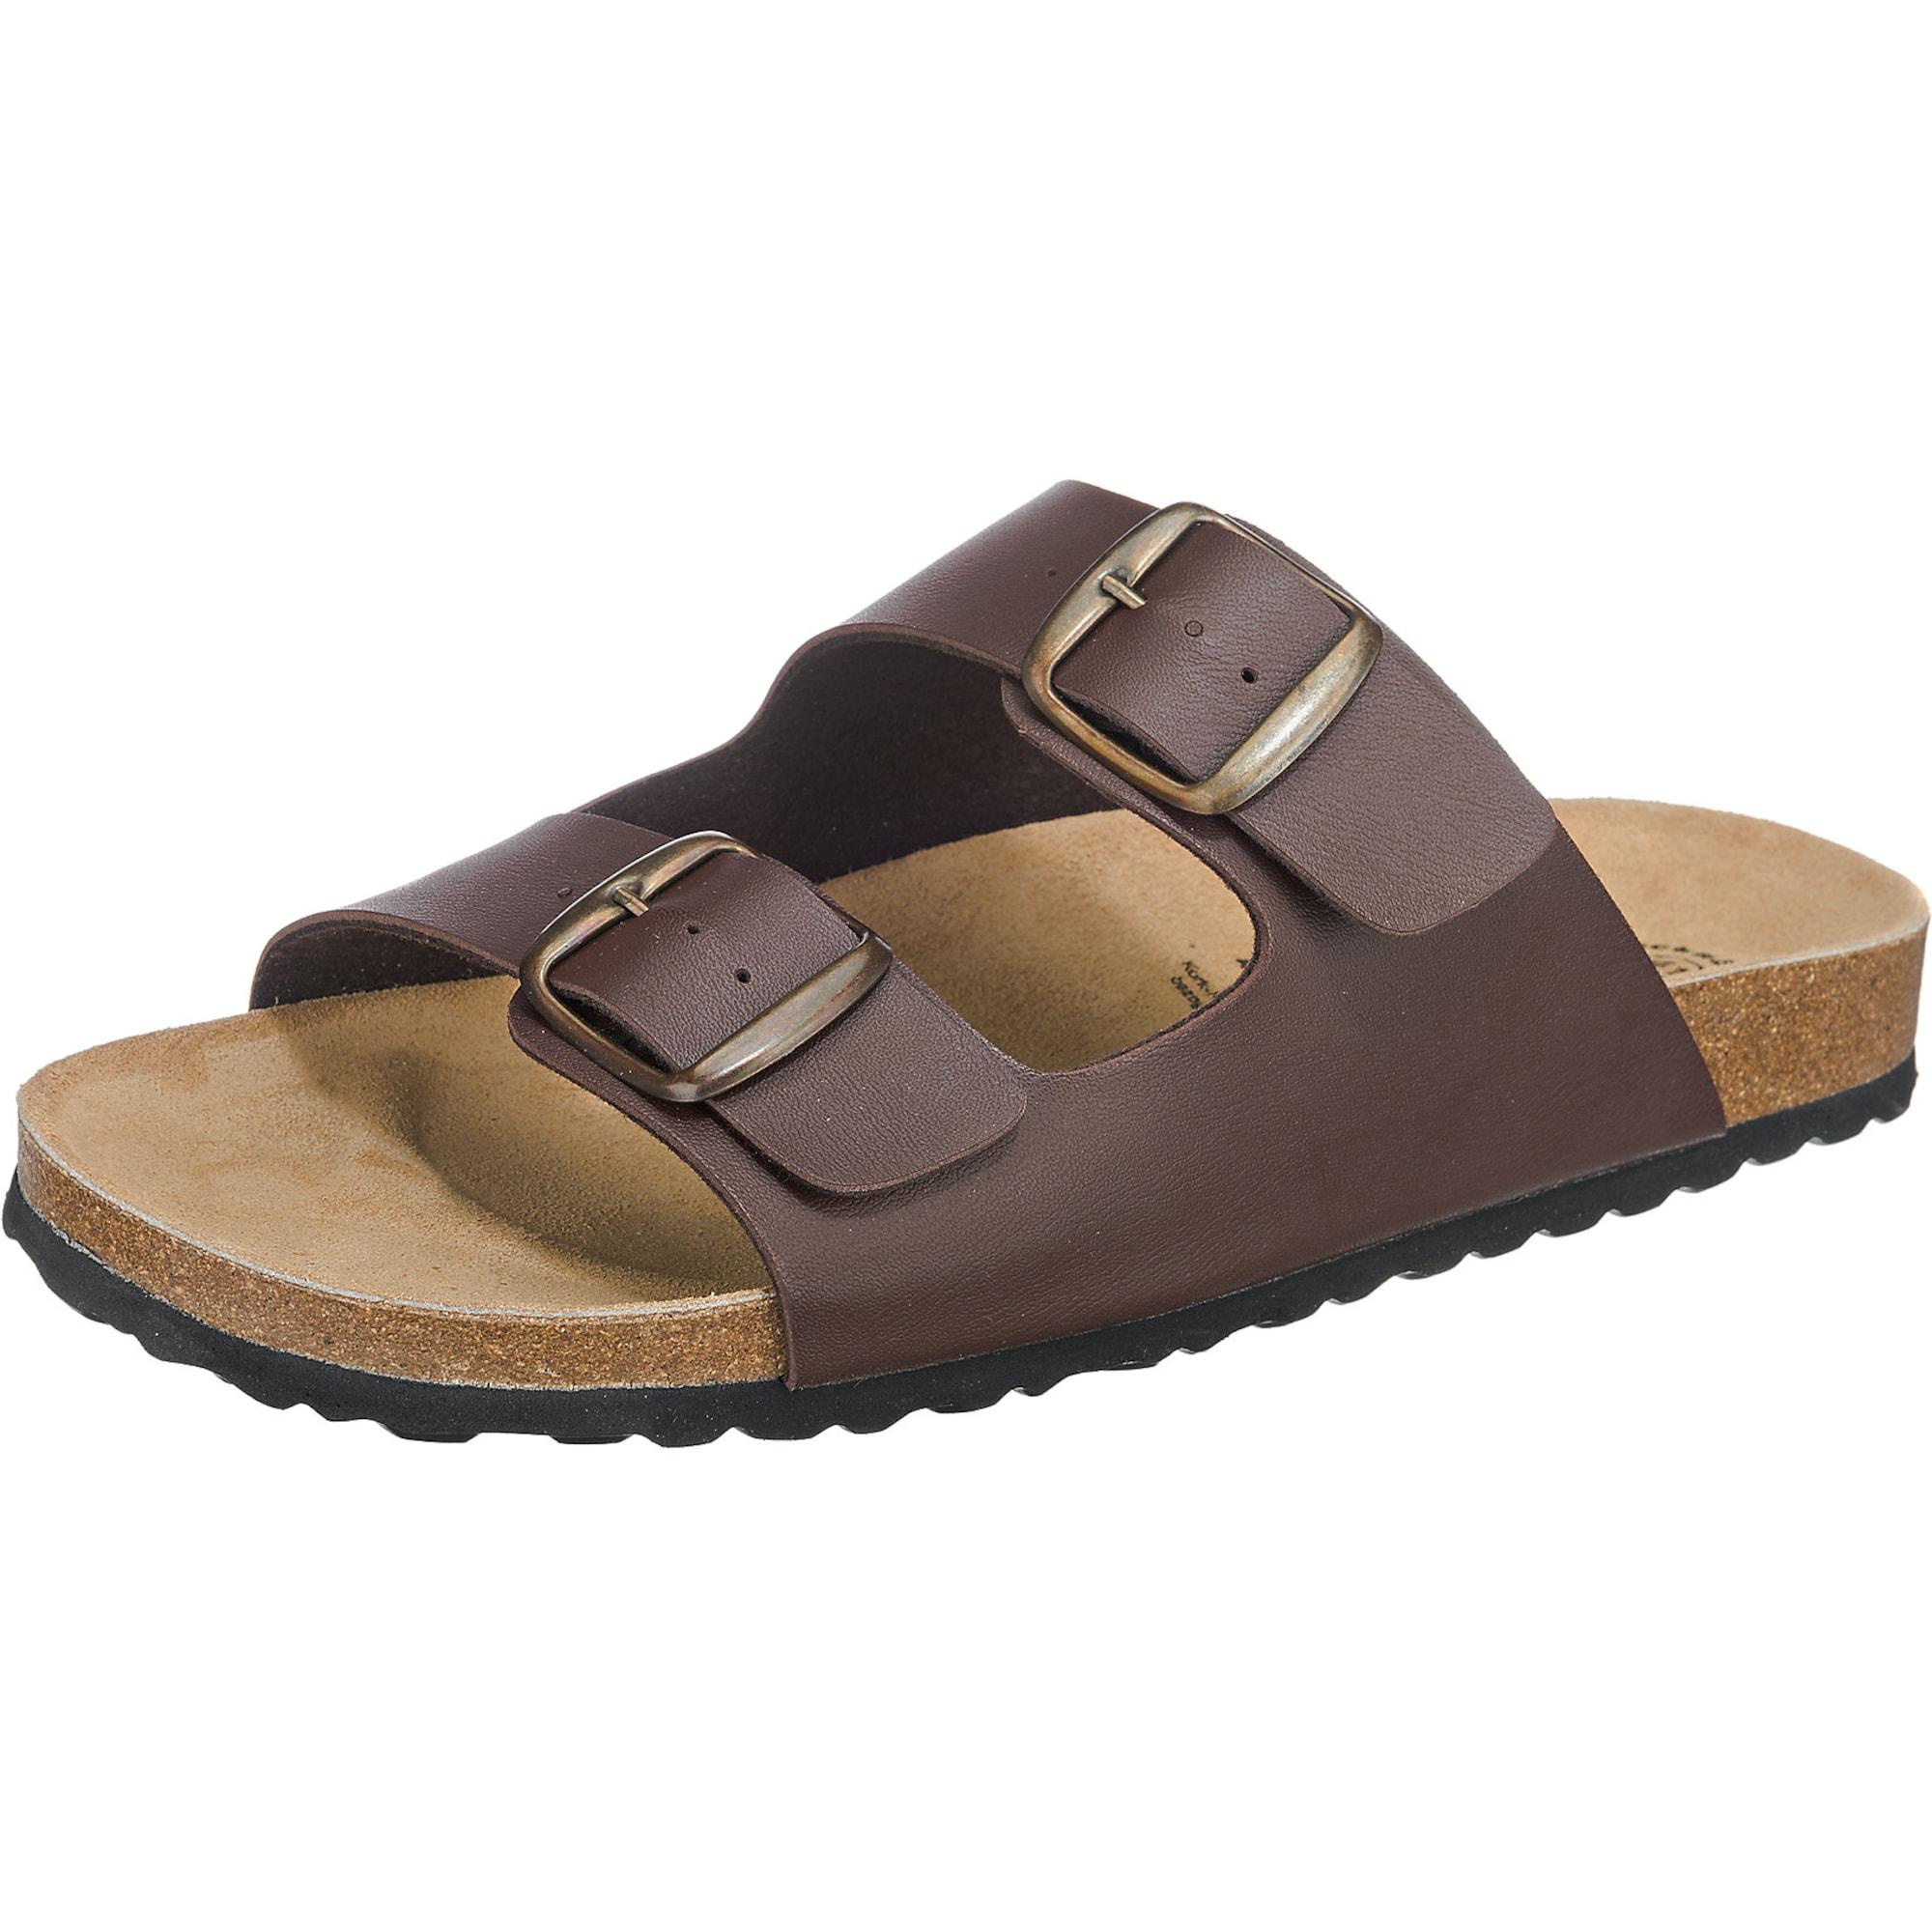 Bioline Man Komfort-Pantoletten | Schuhe > Clogs & Pantoletten > Pantoletten | Braun | LICO